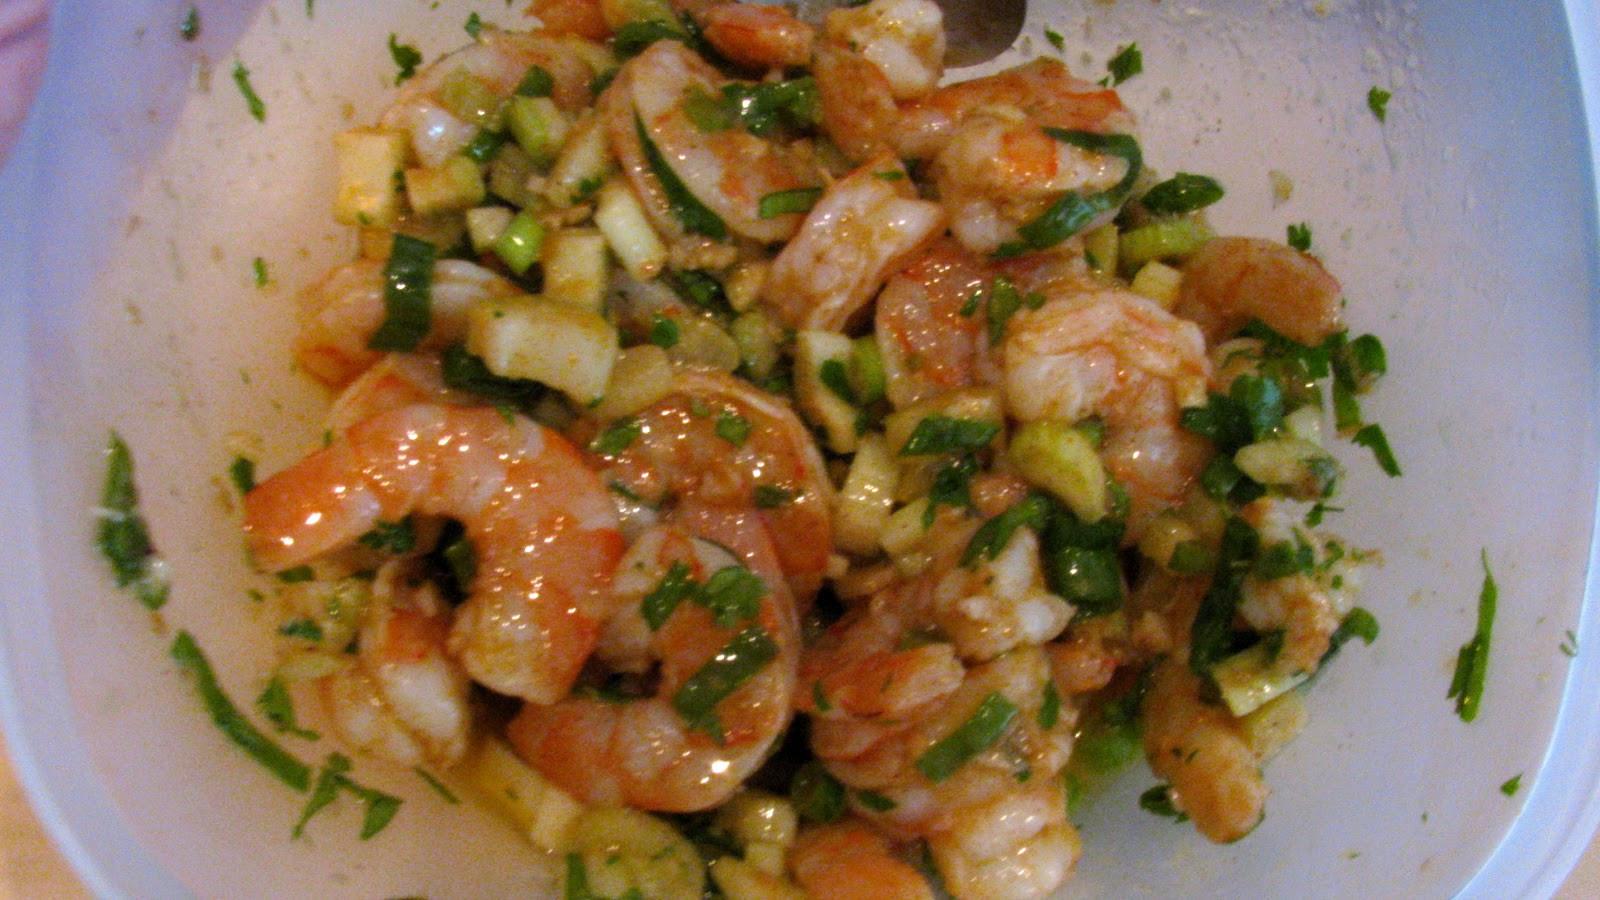 Cold Marinated Shrimp Appetizer  Rita s Recipes Marinated Shrimp